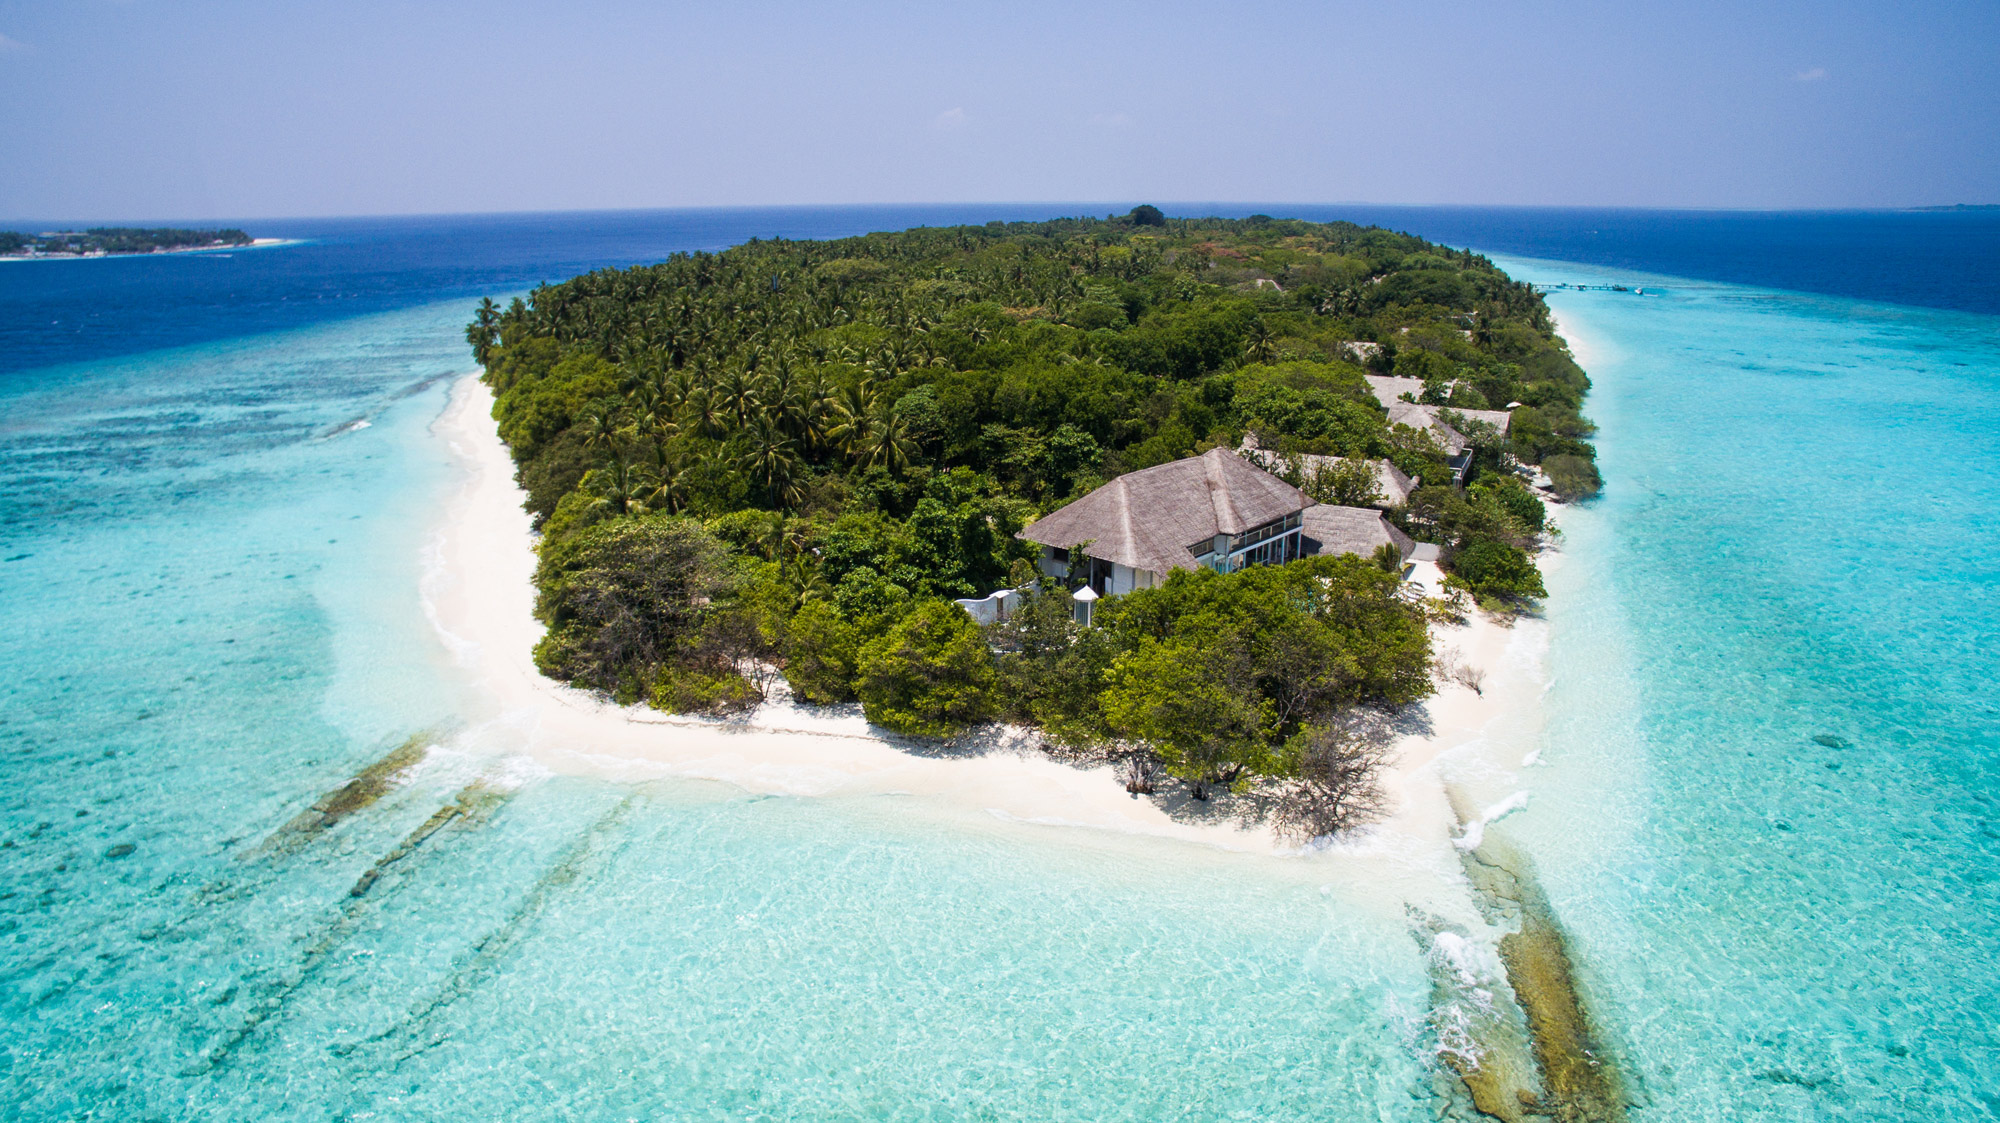 Soneva-Fushi---Villa1-Dolphin-Beach-aerial-3-by-Moritz-Krebs